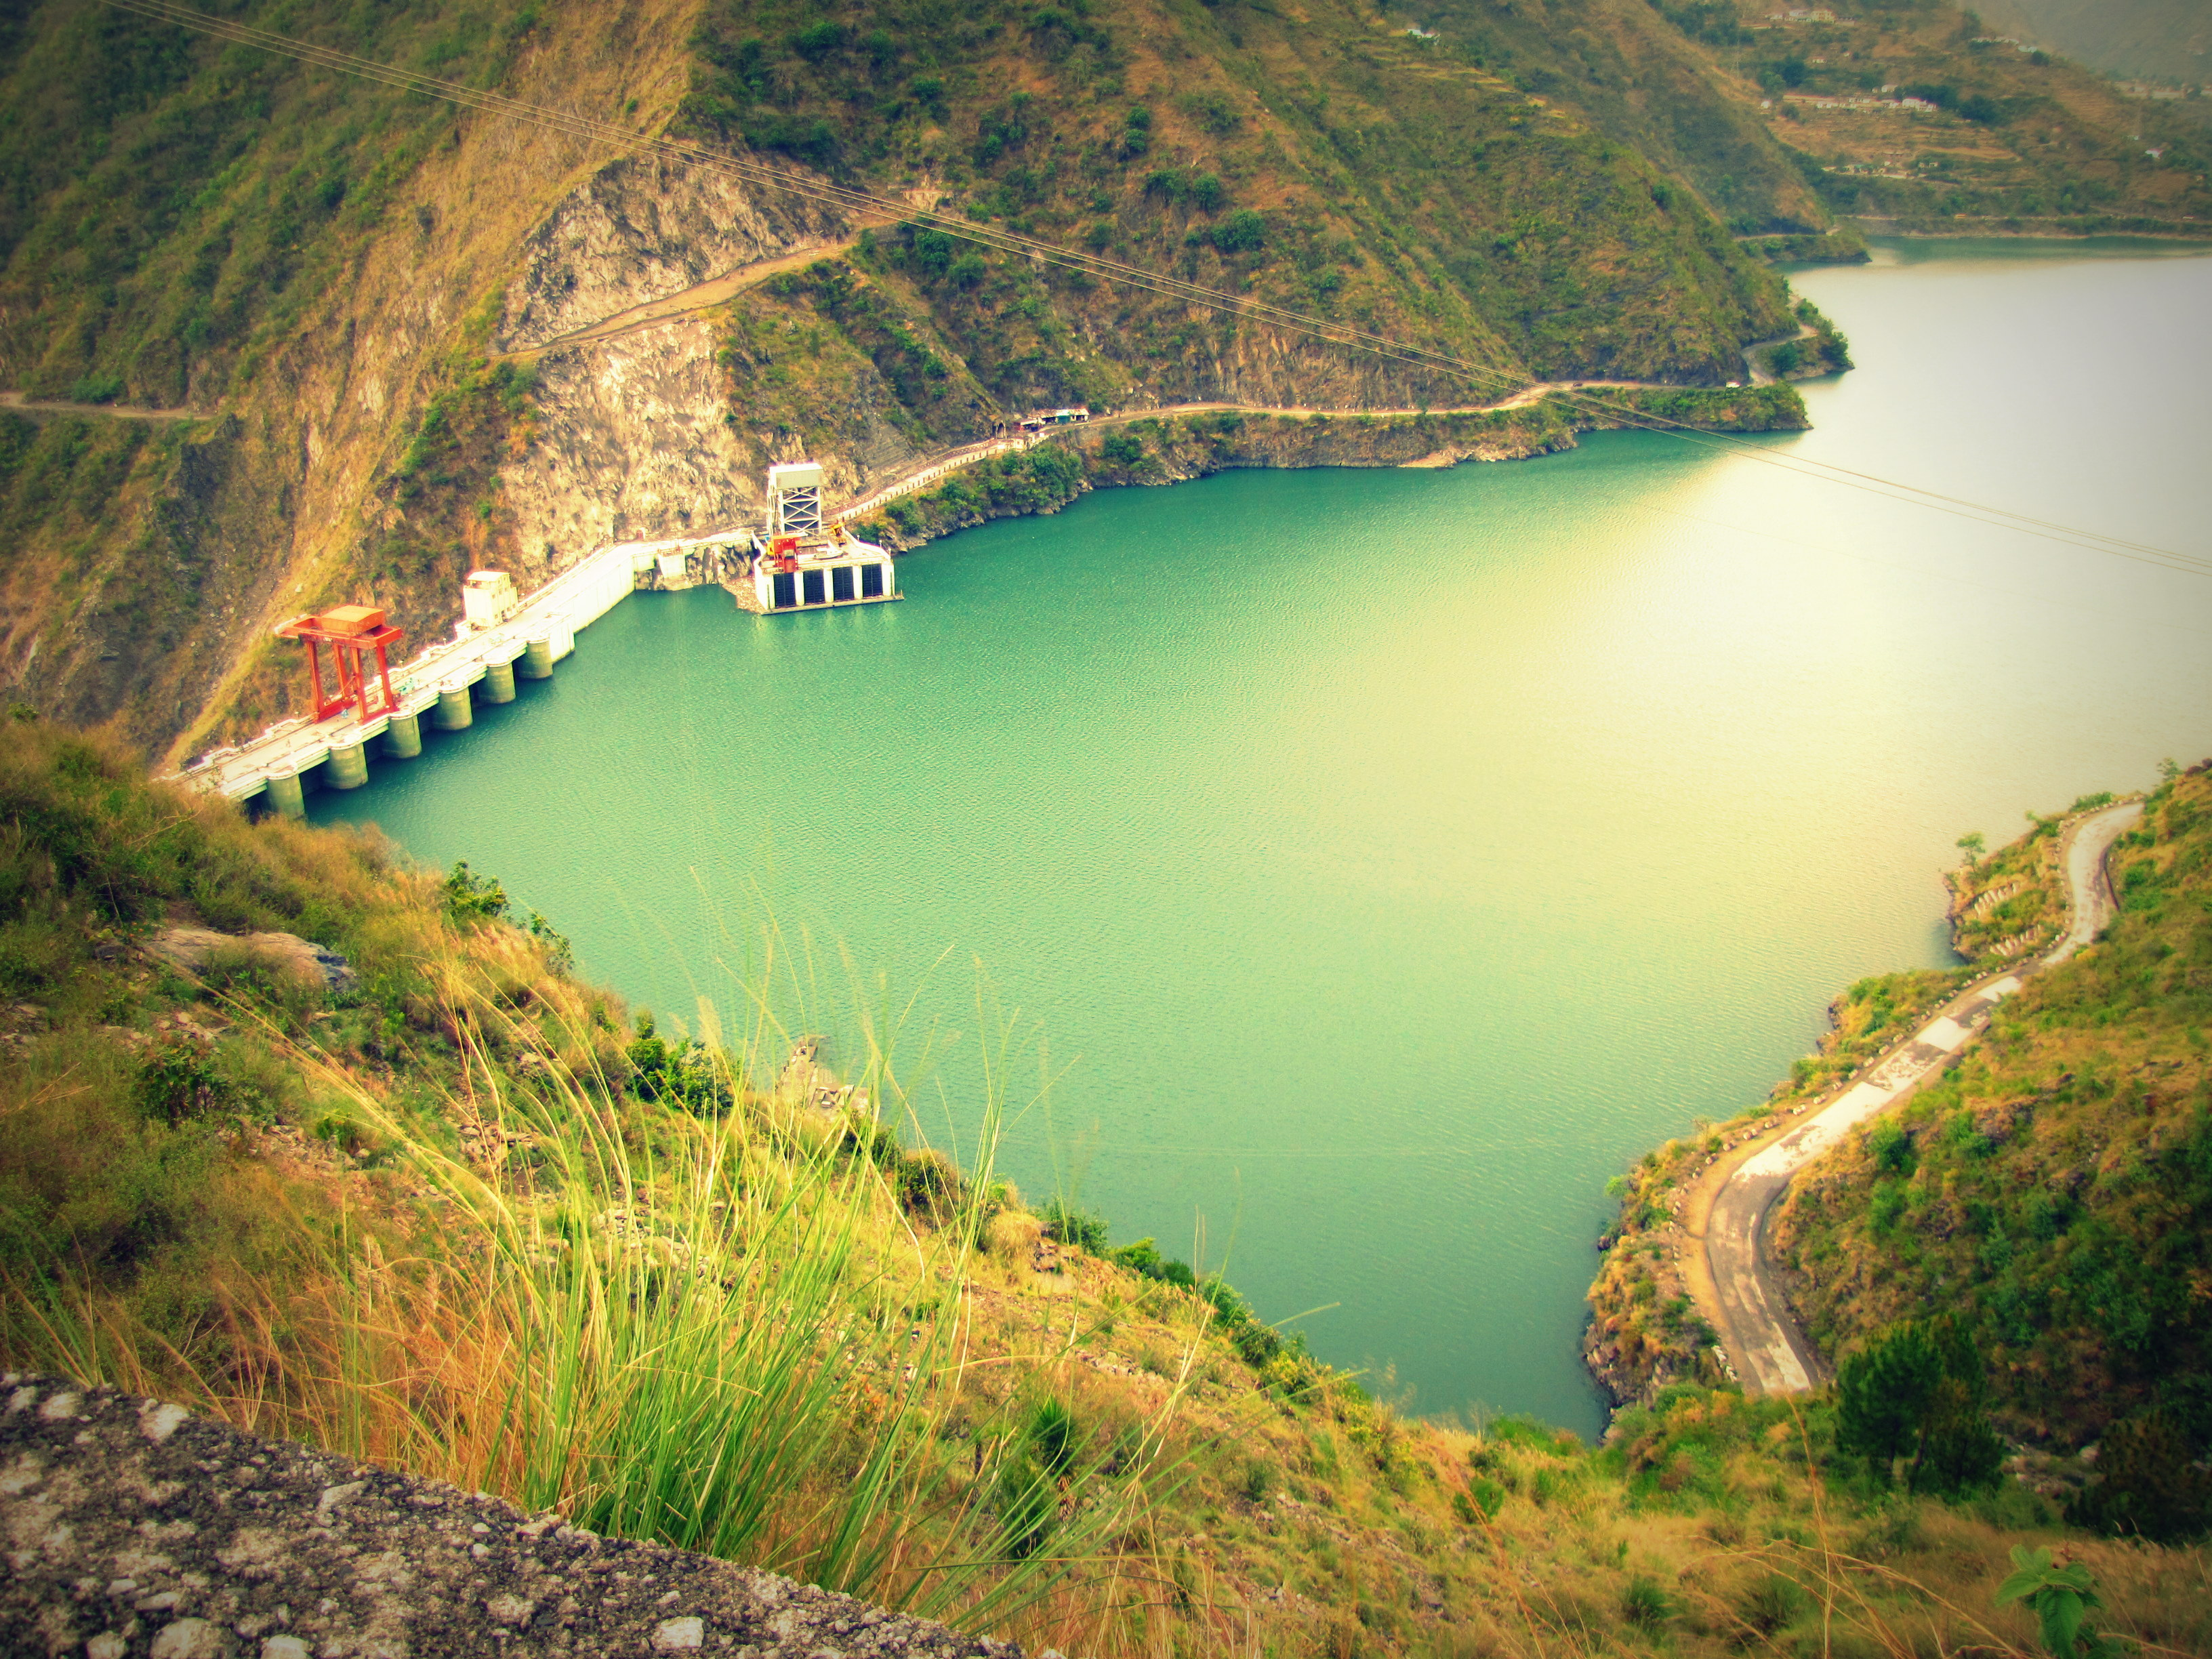 The Chamera Lake